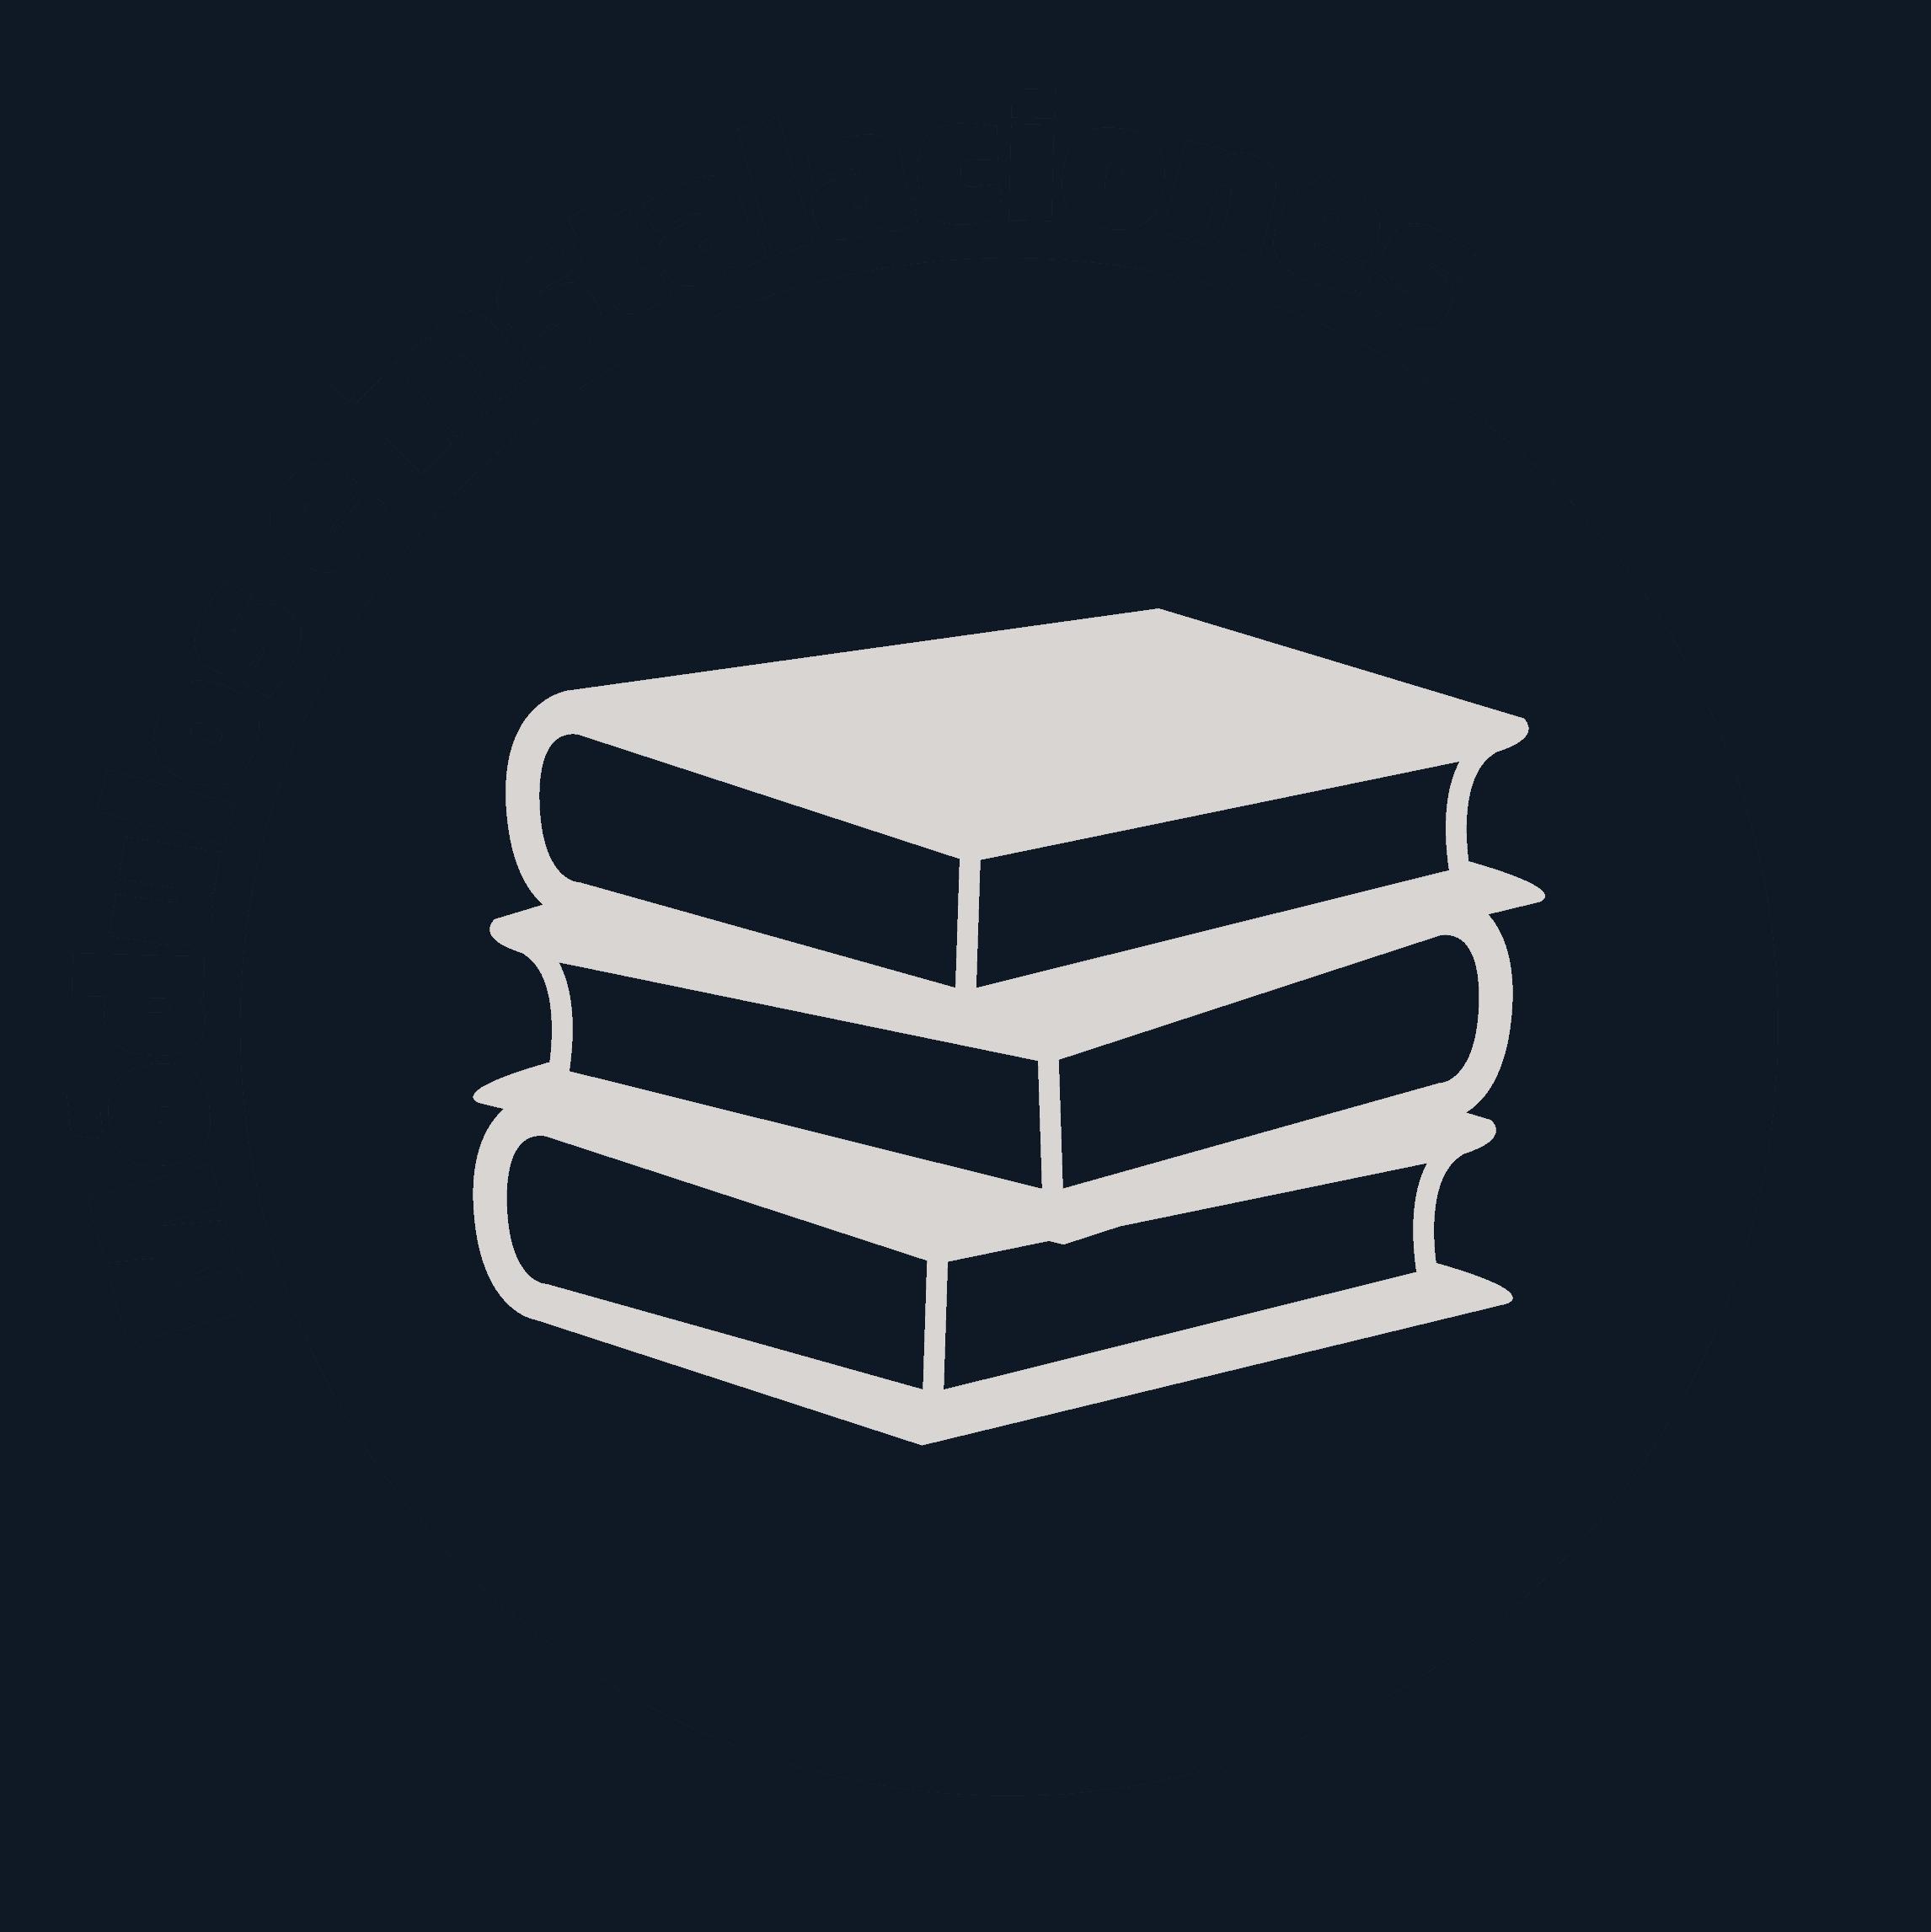 iconos_experto-05-min